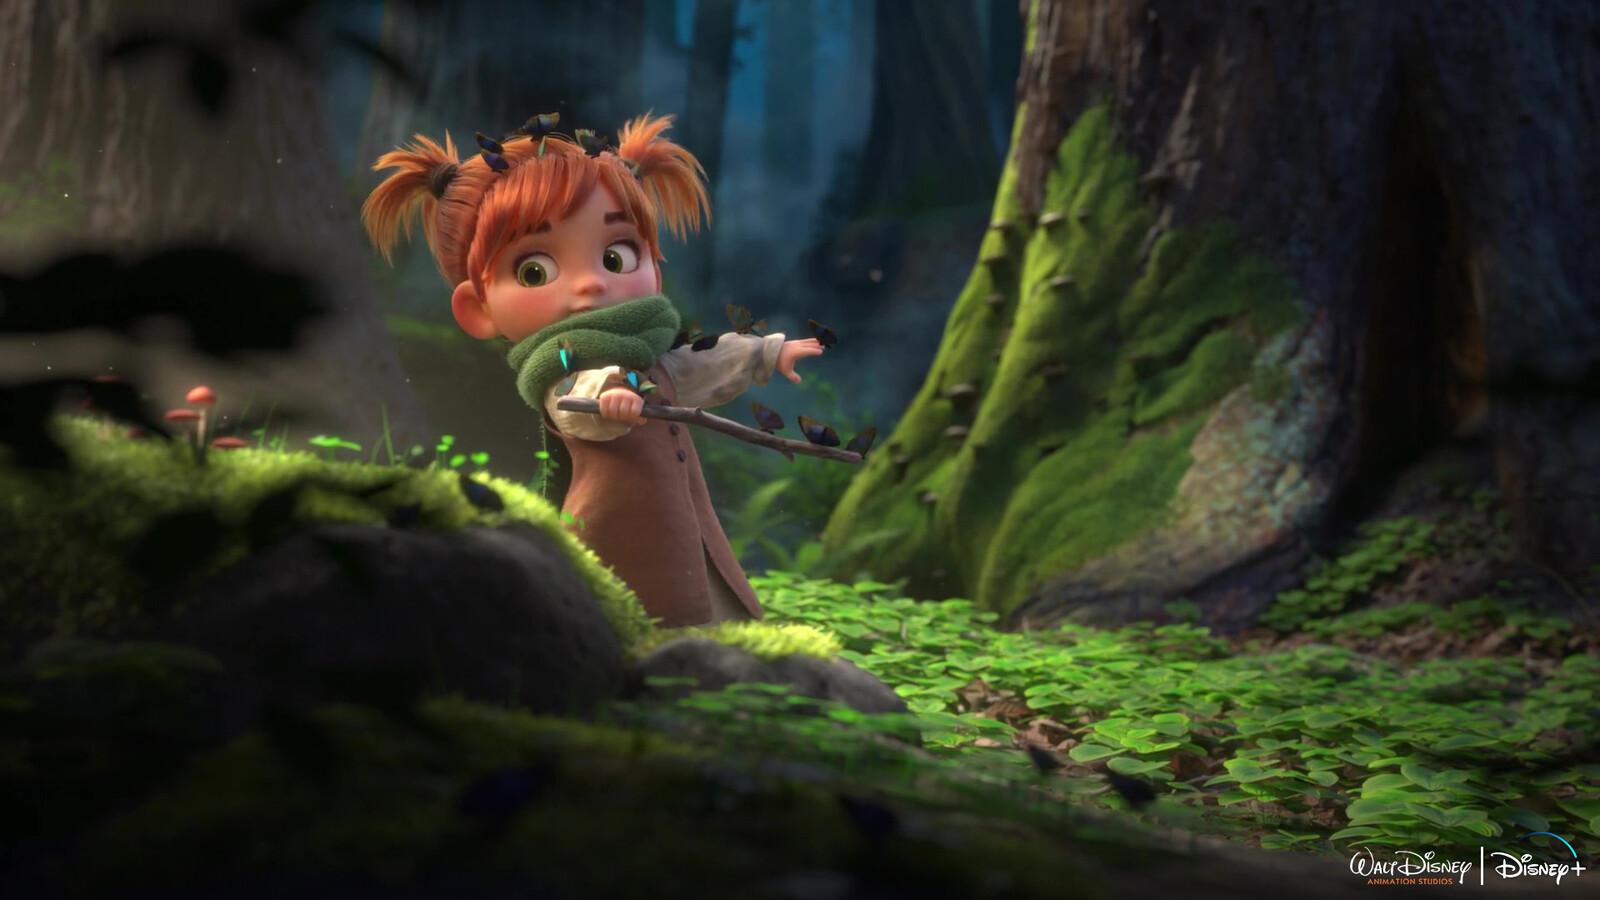 Film Screen cap